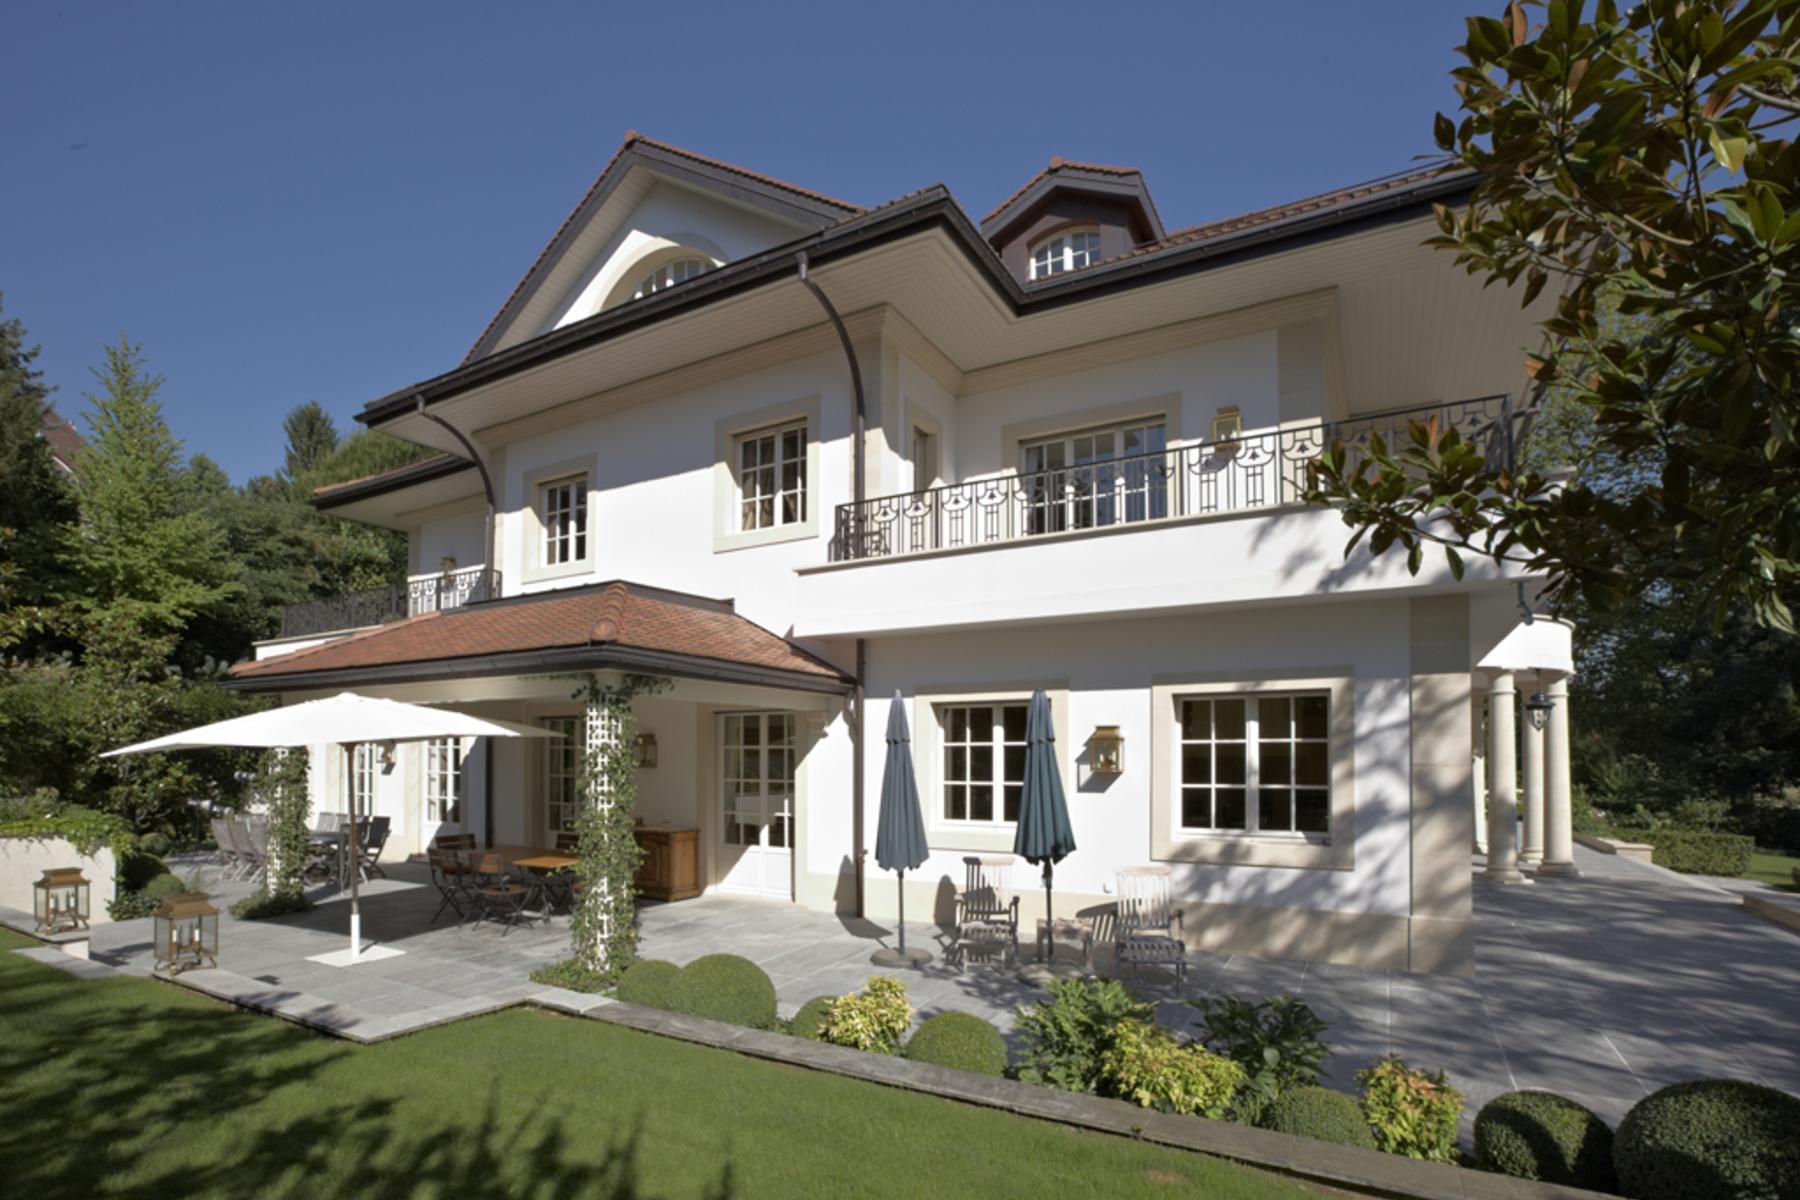 Single Family Homes for Sale at Superb mansion close to Denantou park Lausanne Lausanne, Vaud 1006 Switzerland